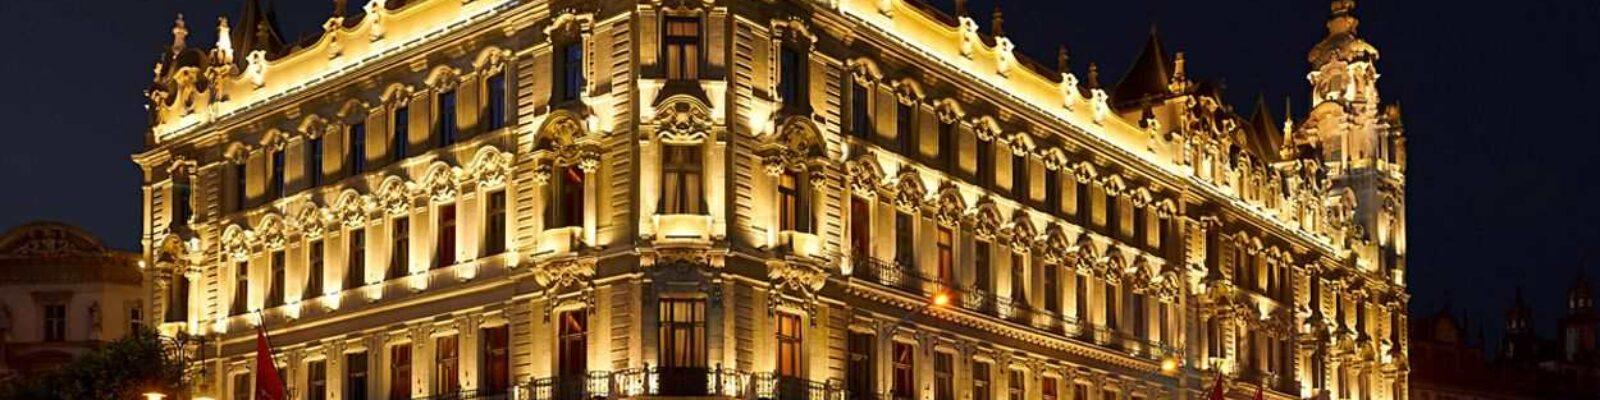 Hungary Budapest Klotild Palace